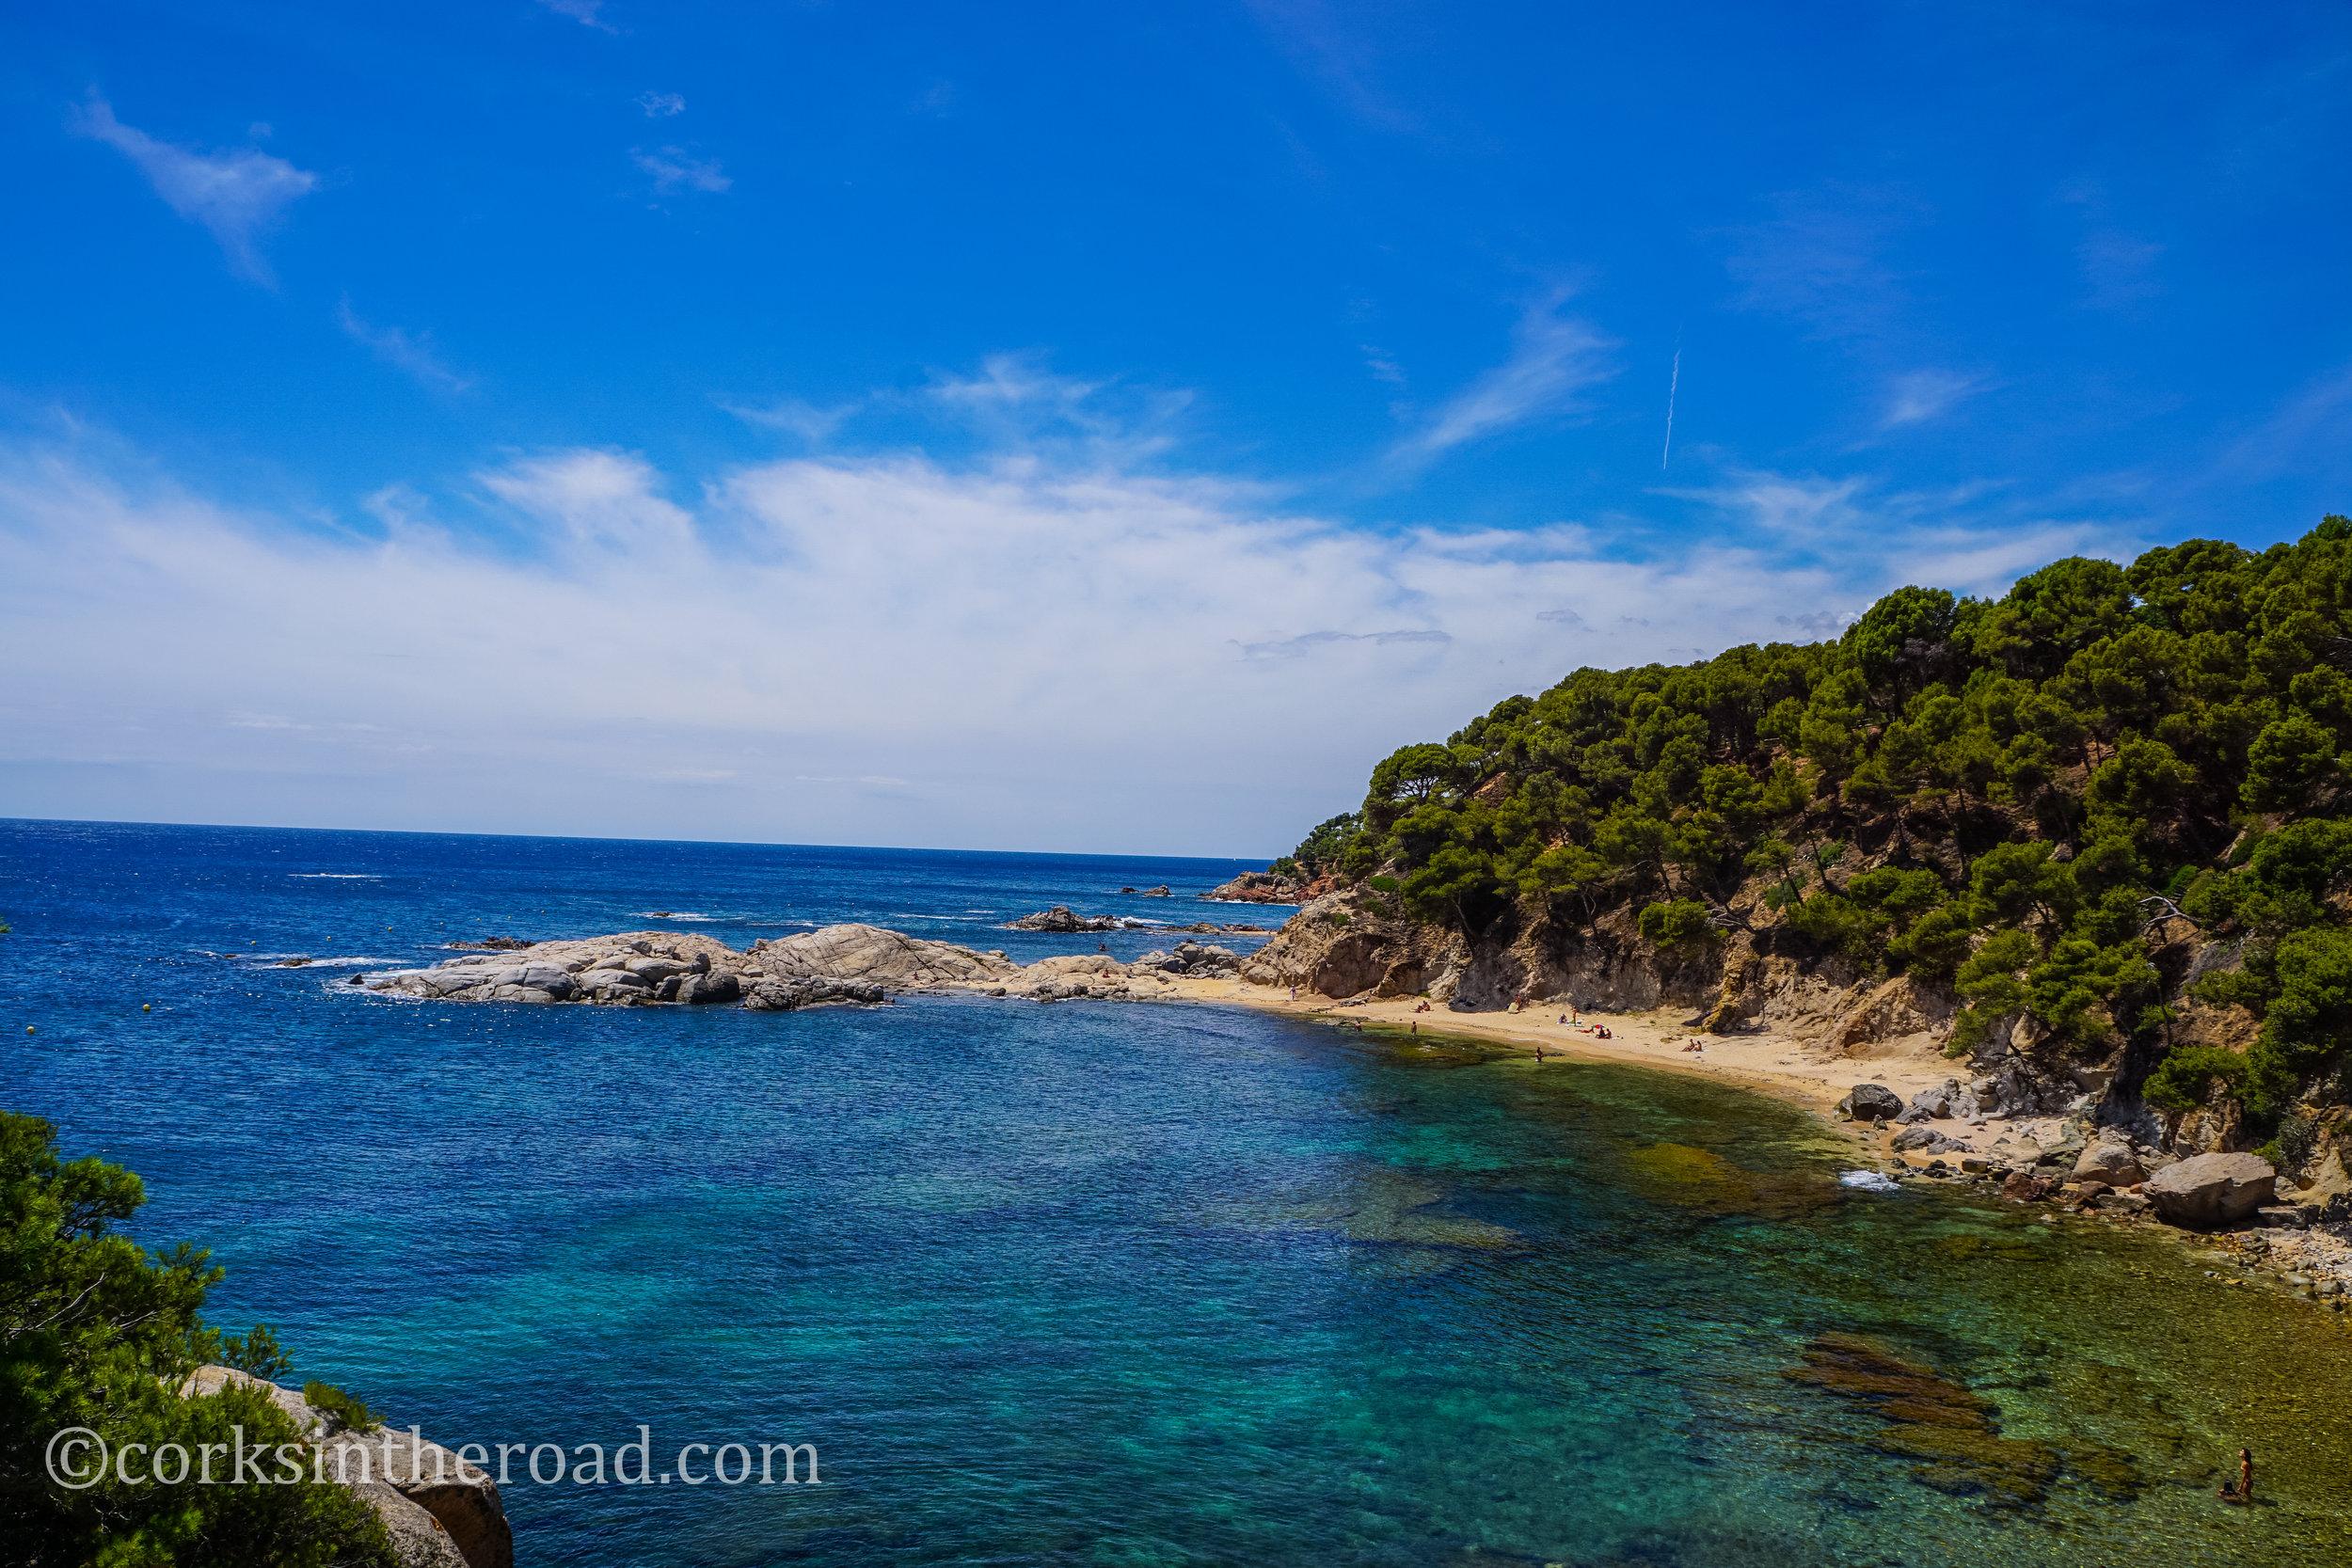 20160810Barcelona, Corksintheroad, Costa Brava, Costa Brava Landscape-44.jpg